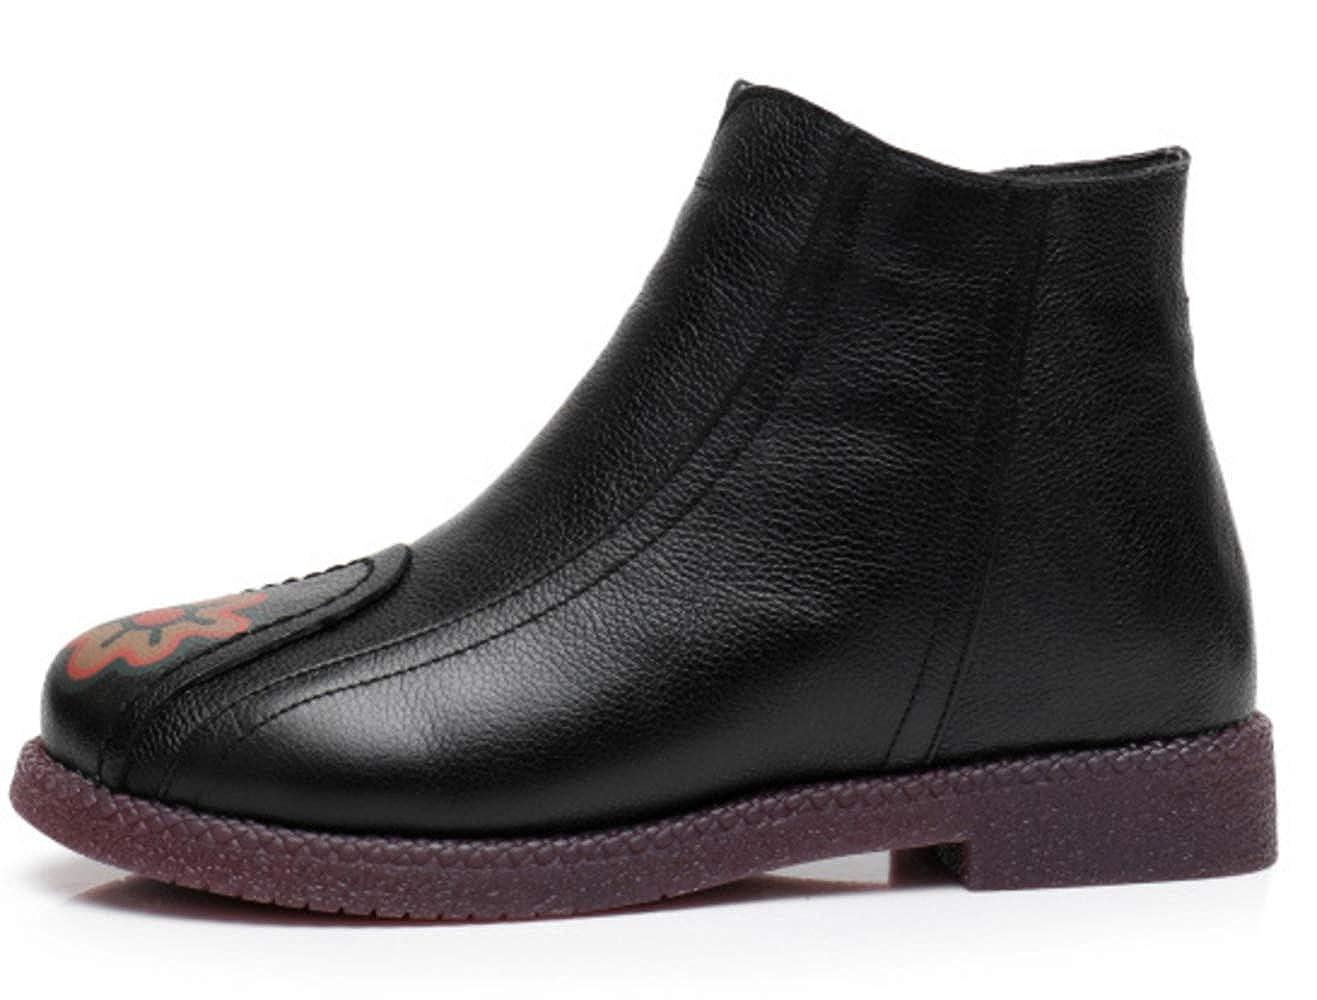 f5ccea0bcfecd0 Shiney Damen Baumwolle Schuhe Leder National Style Printed Printed Printed  Plus Samt Warme Stiefeletten Retro Winter 5c5141